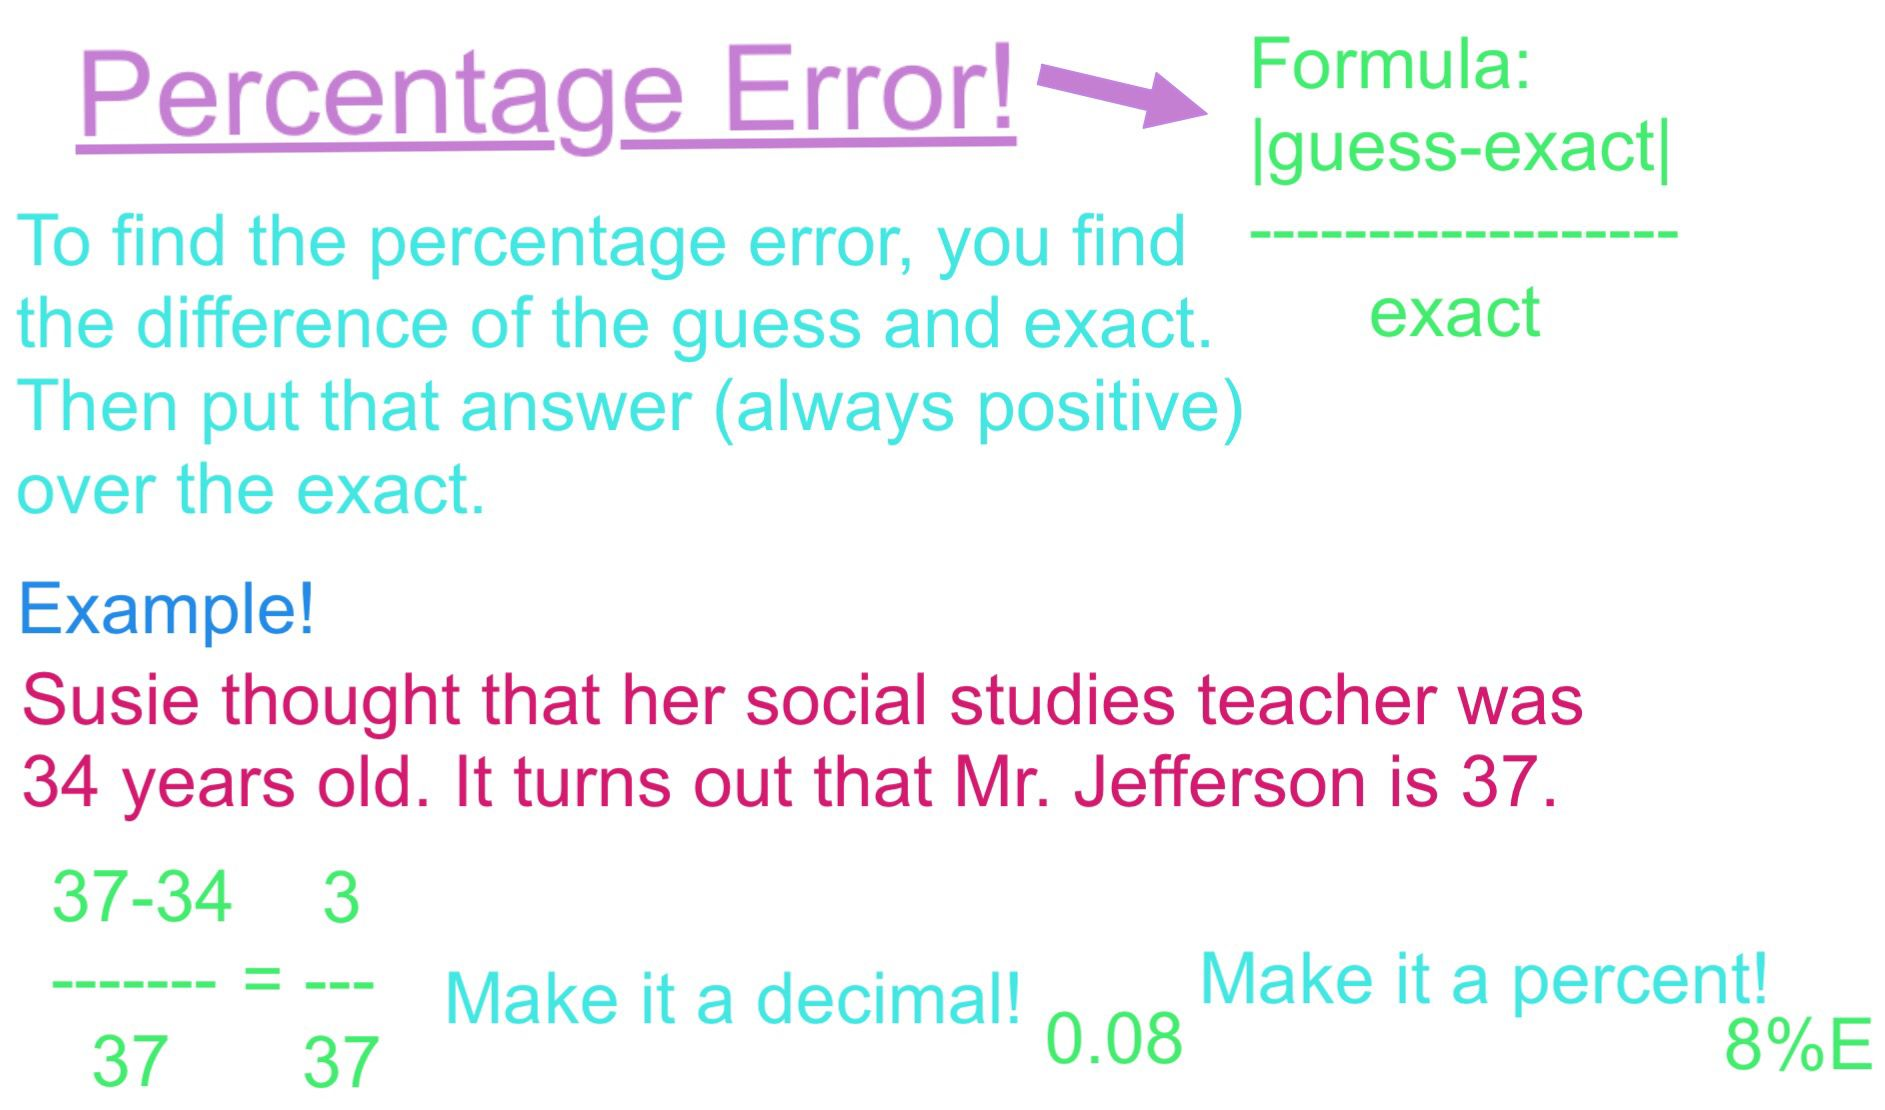 Percentage Error Social Studies Teacher Middle School Math Middle School